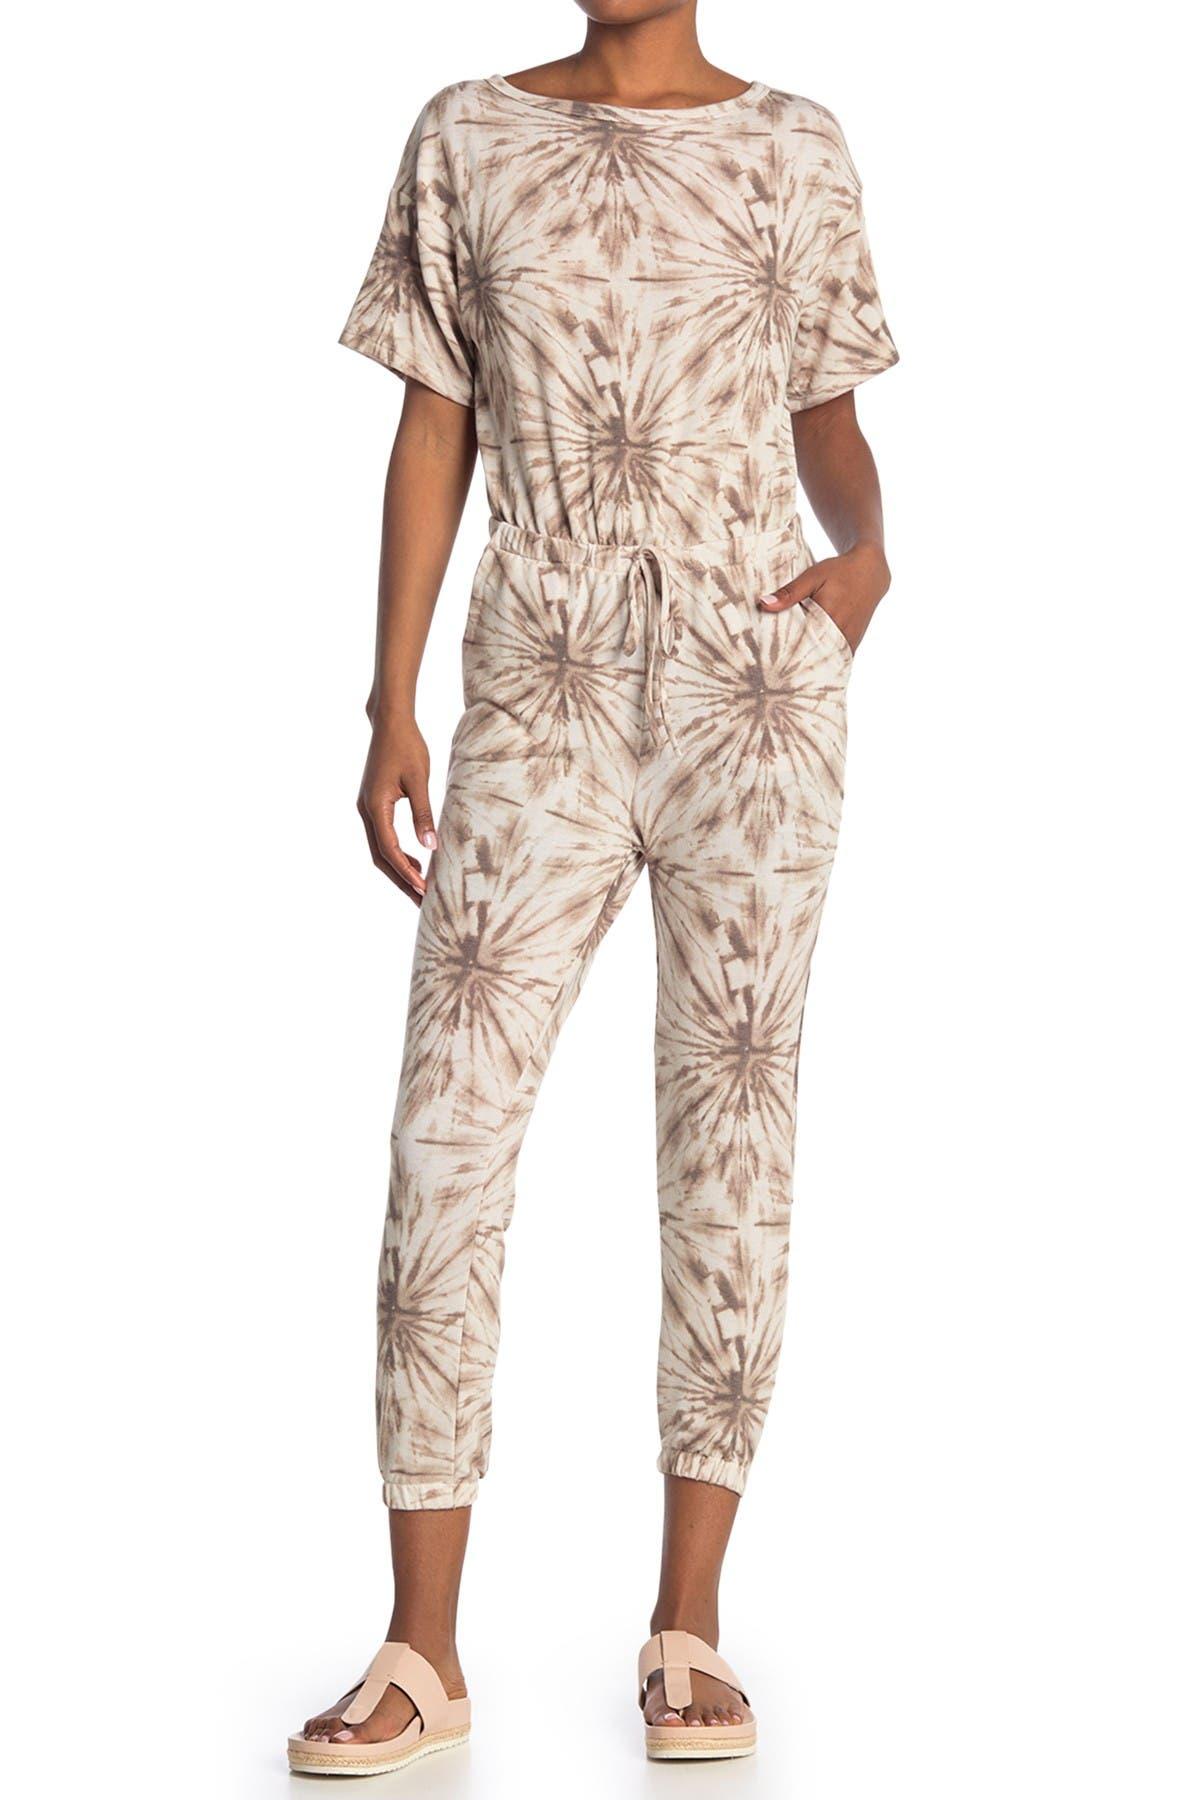 Image of Lush Short Sleeve Geometric Print Jumpsuit